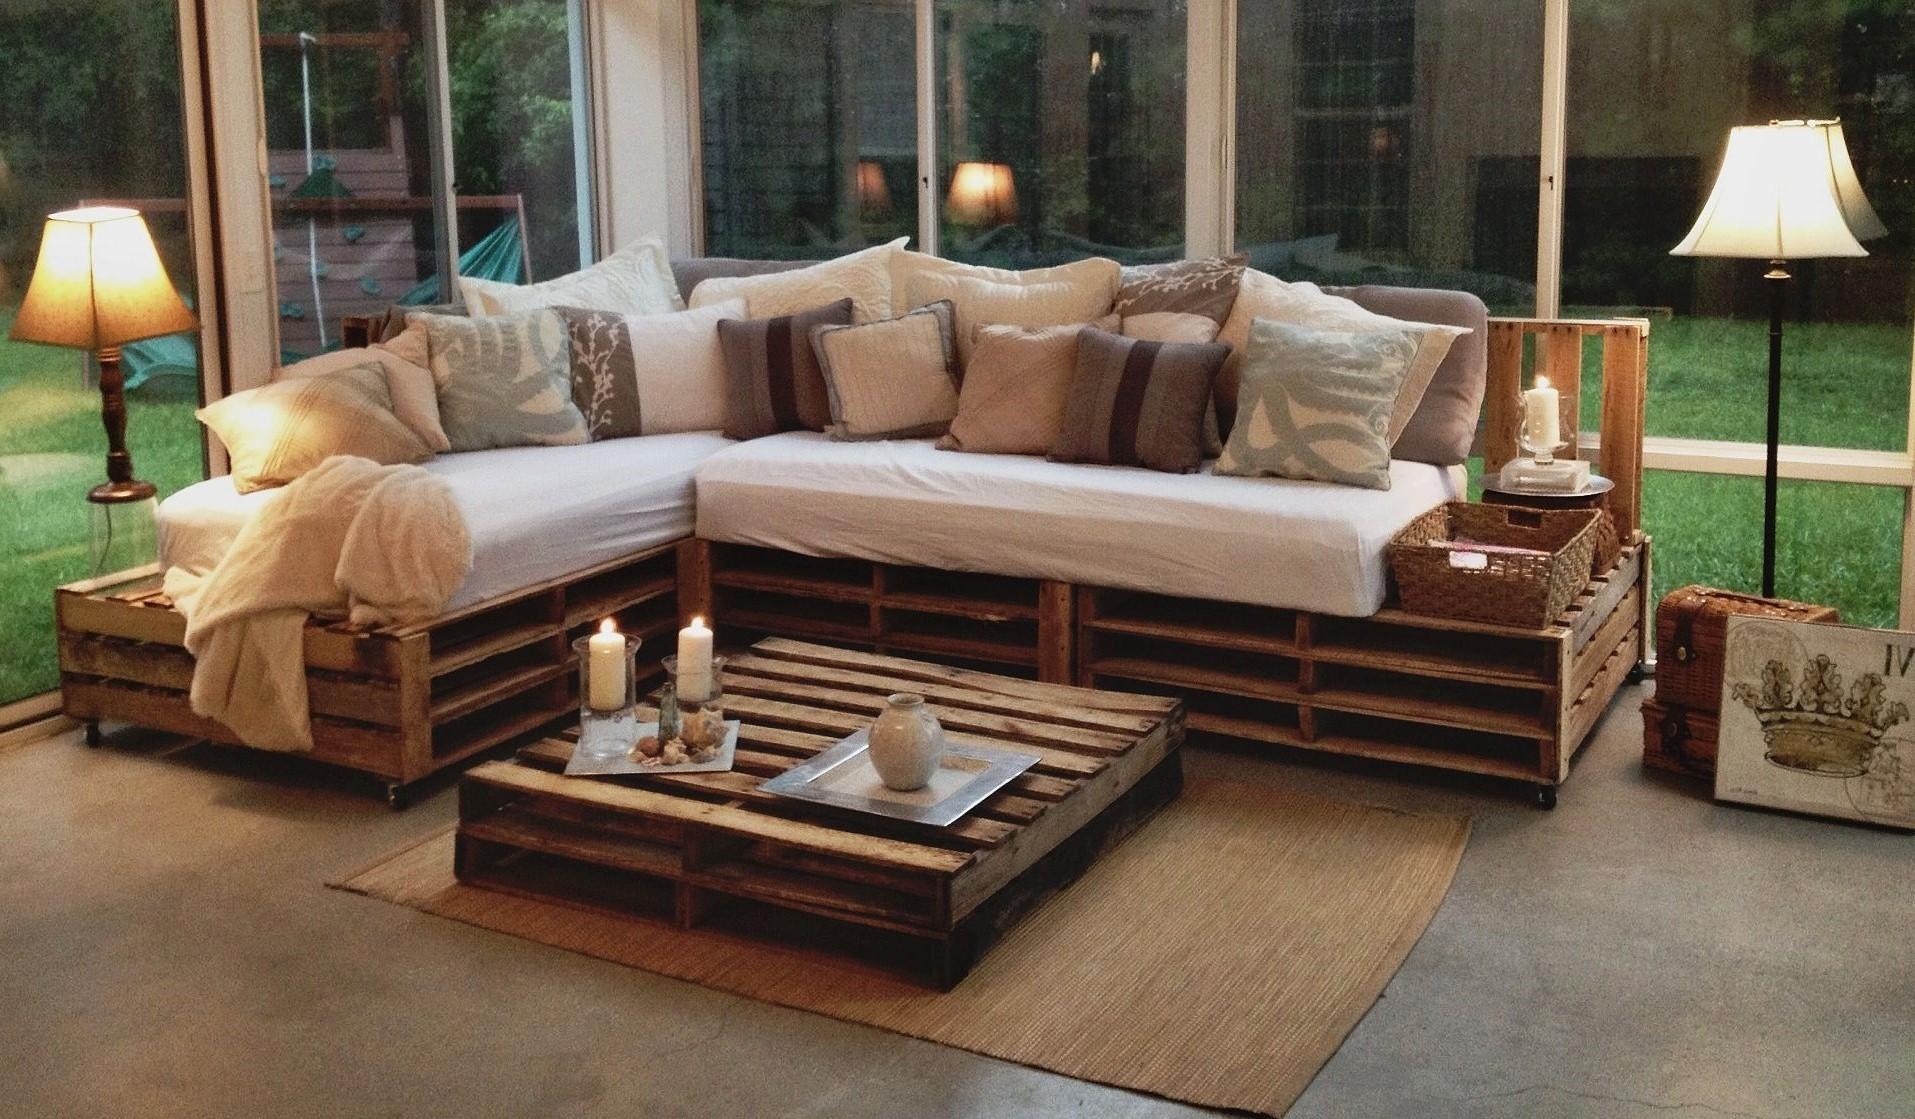 Plan de salon de jardin en palette DIY.